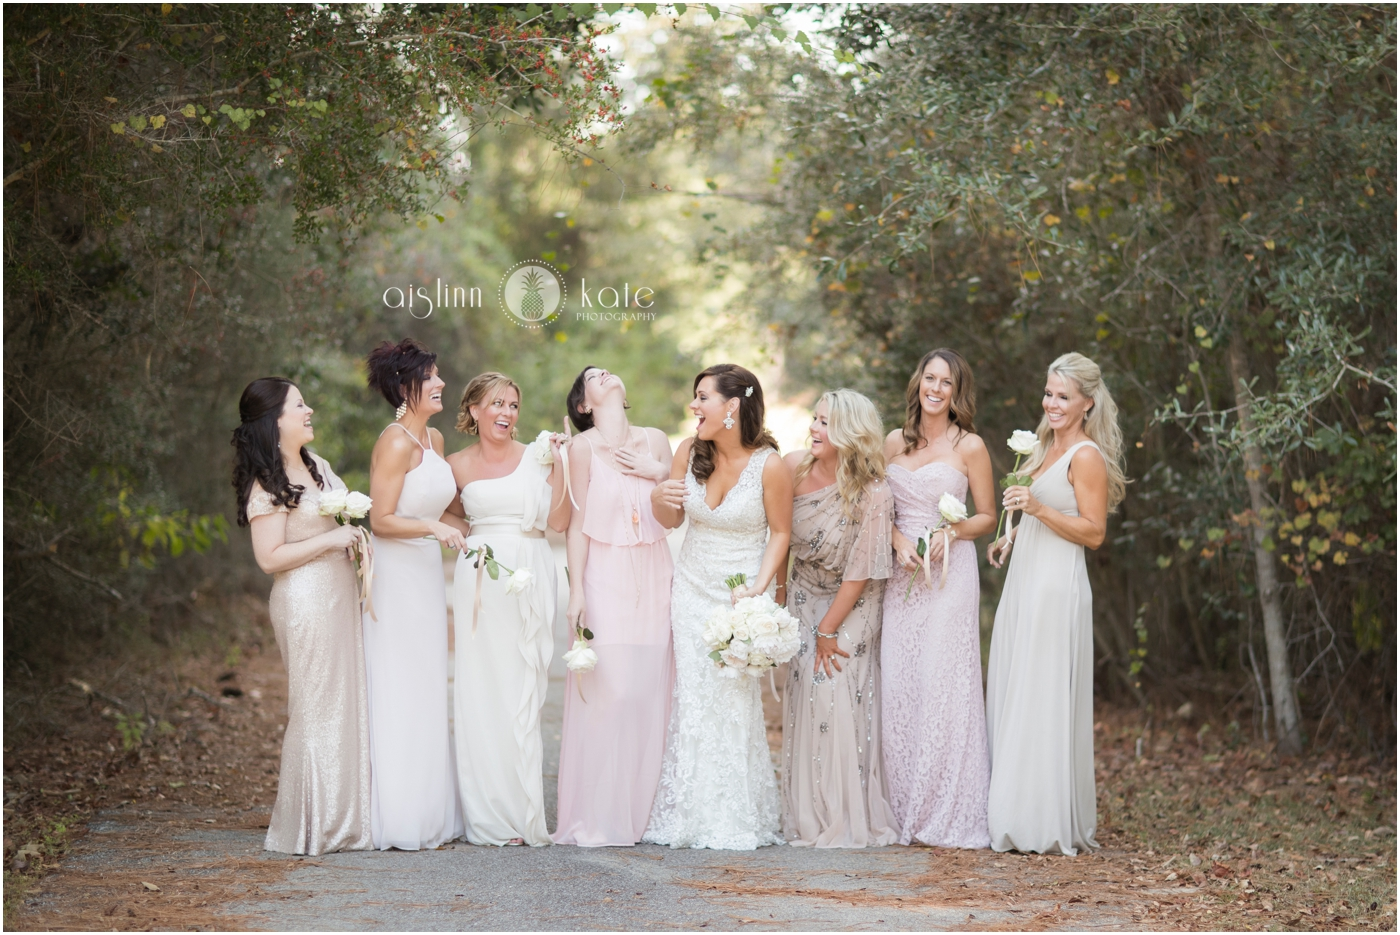 Pensacola-Destin-Wedding-Photographer_9314.jpg